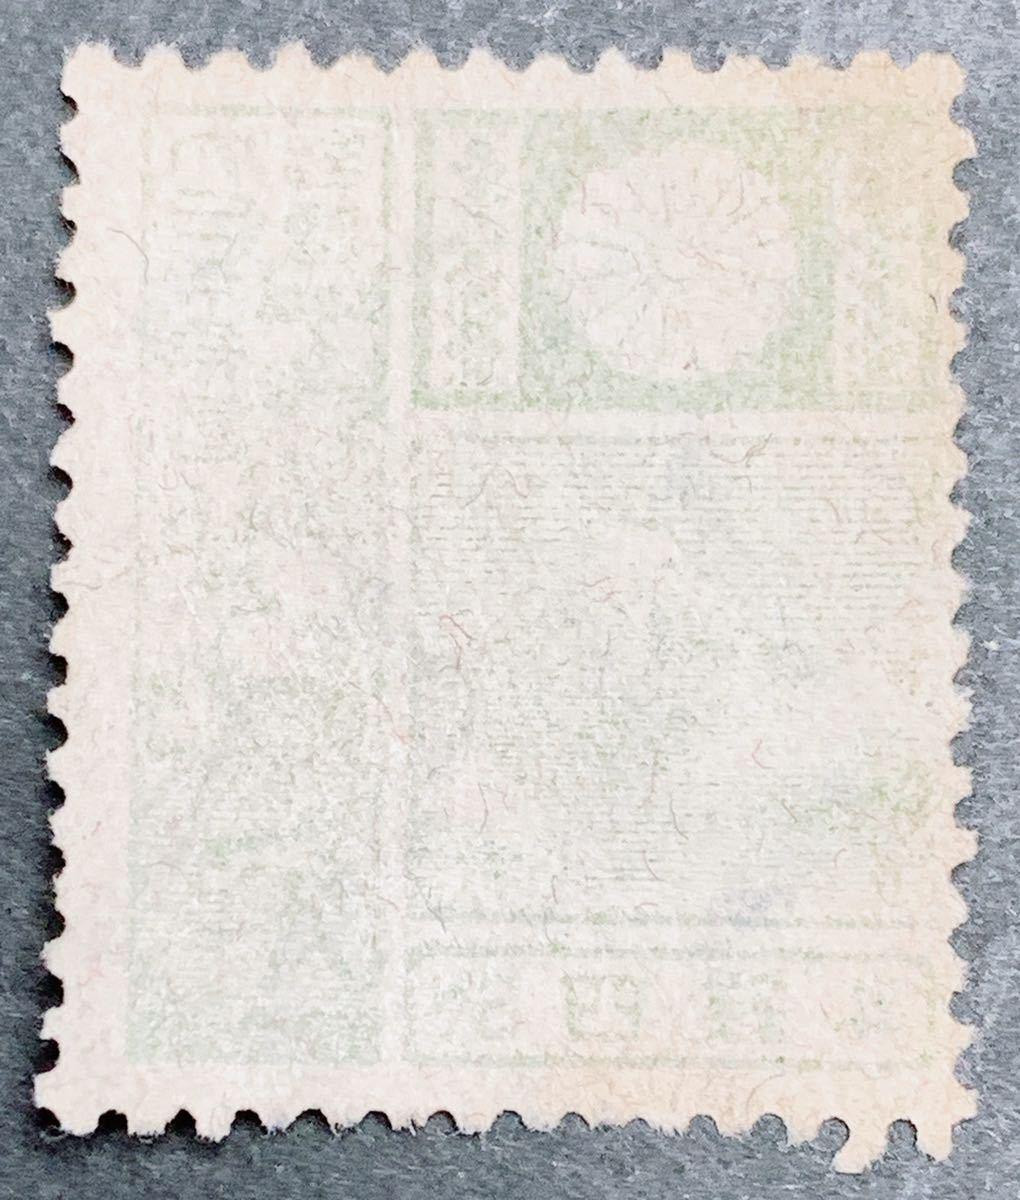 富士鹿旧版4銭 OSAKA/10.12.24/JAPAN_画像2